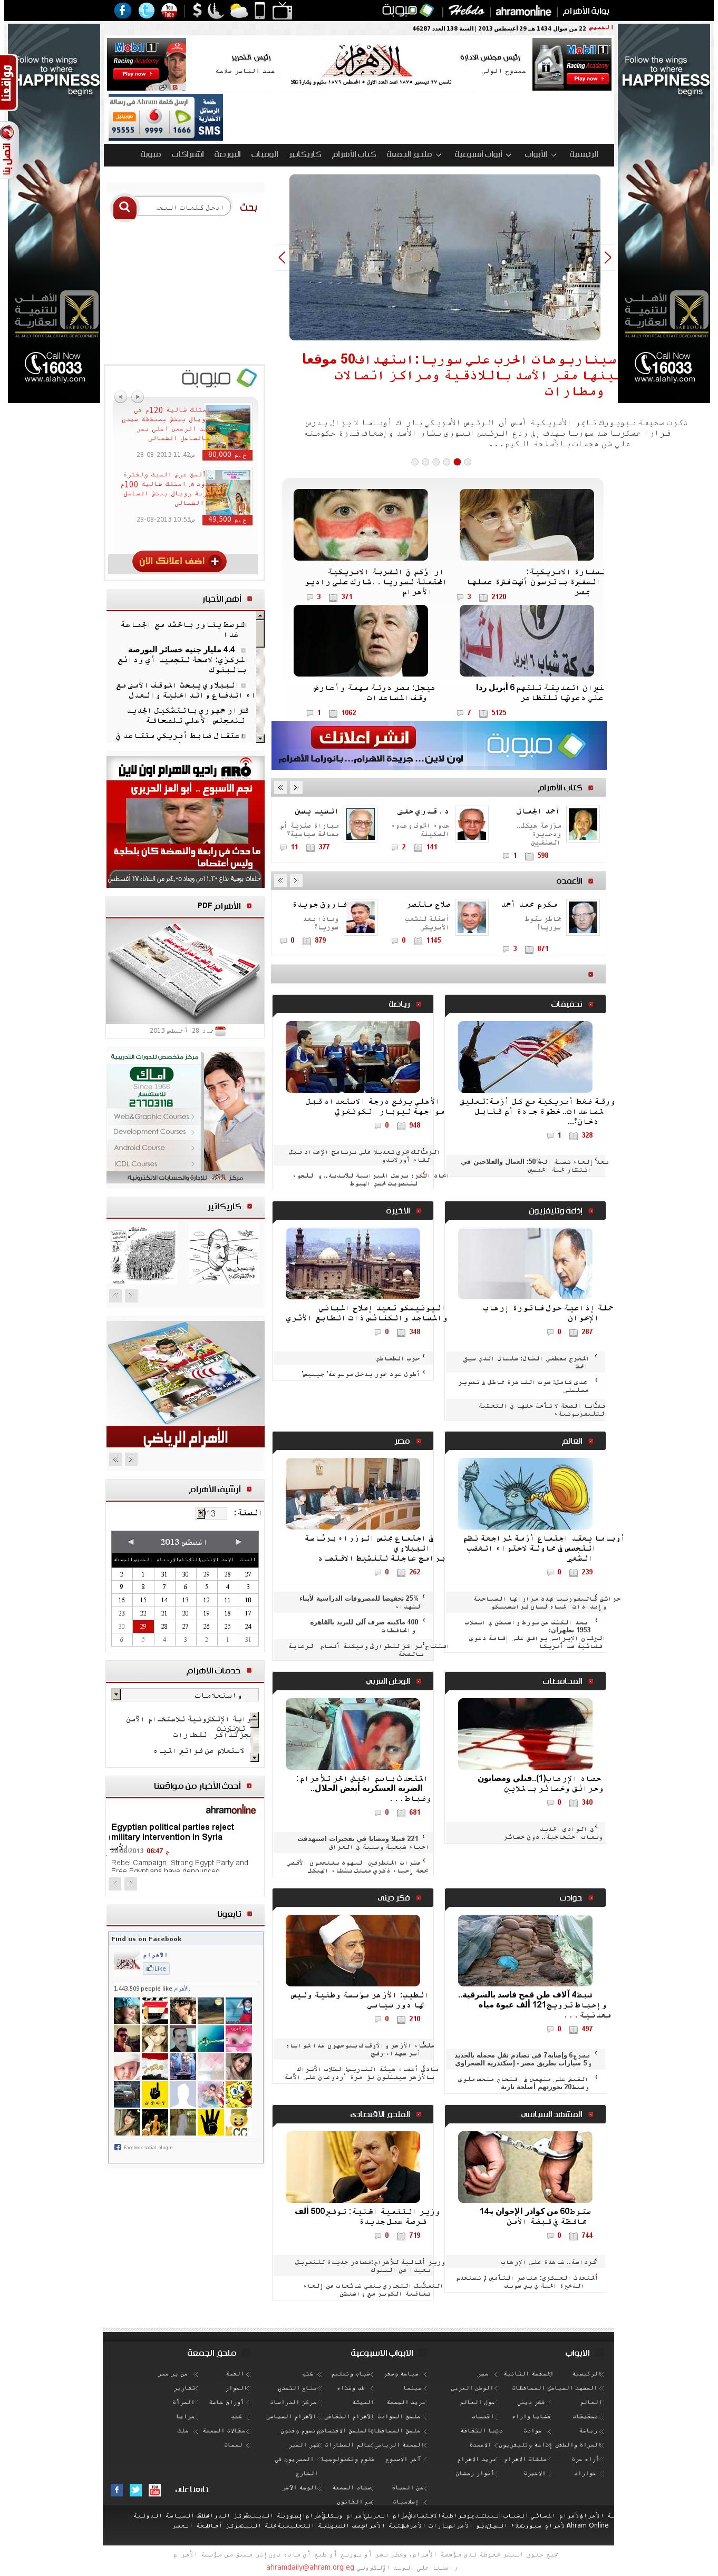 Al-Ahram at Thursday Aug. 29, 2013, 7 a.m. UTC